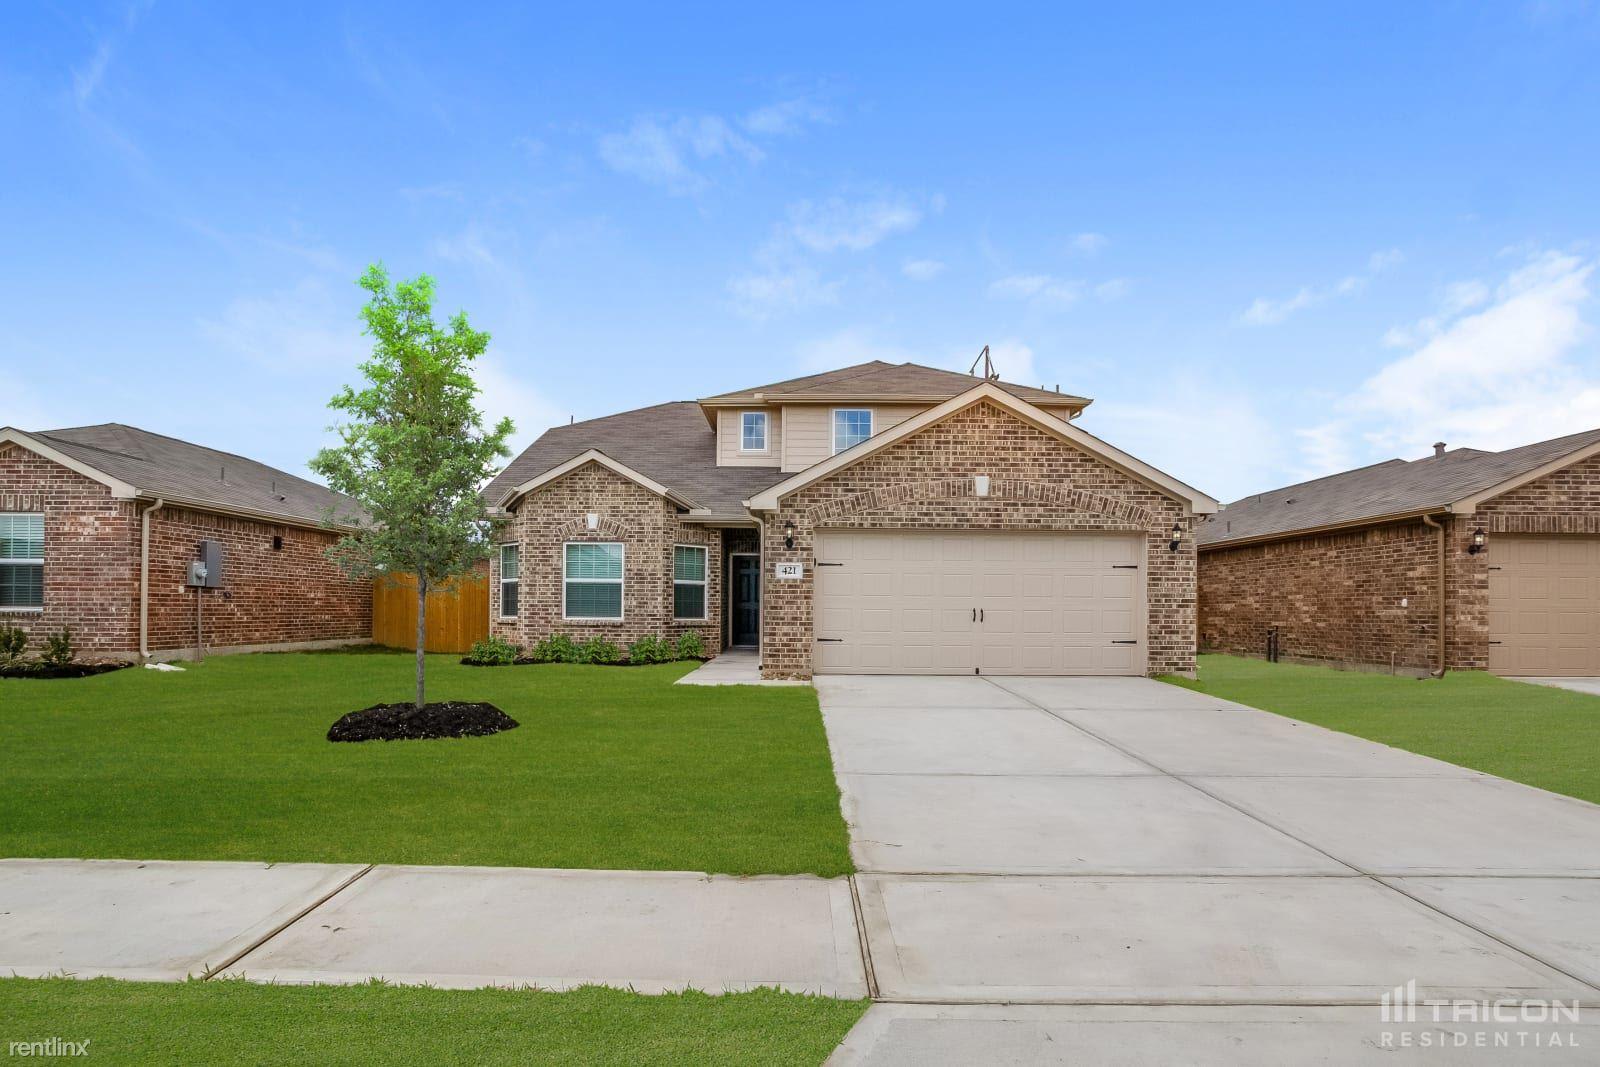 421 Palomino Stand Drive, La Marque, TX - $1,899 USD/ month